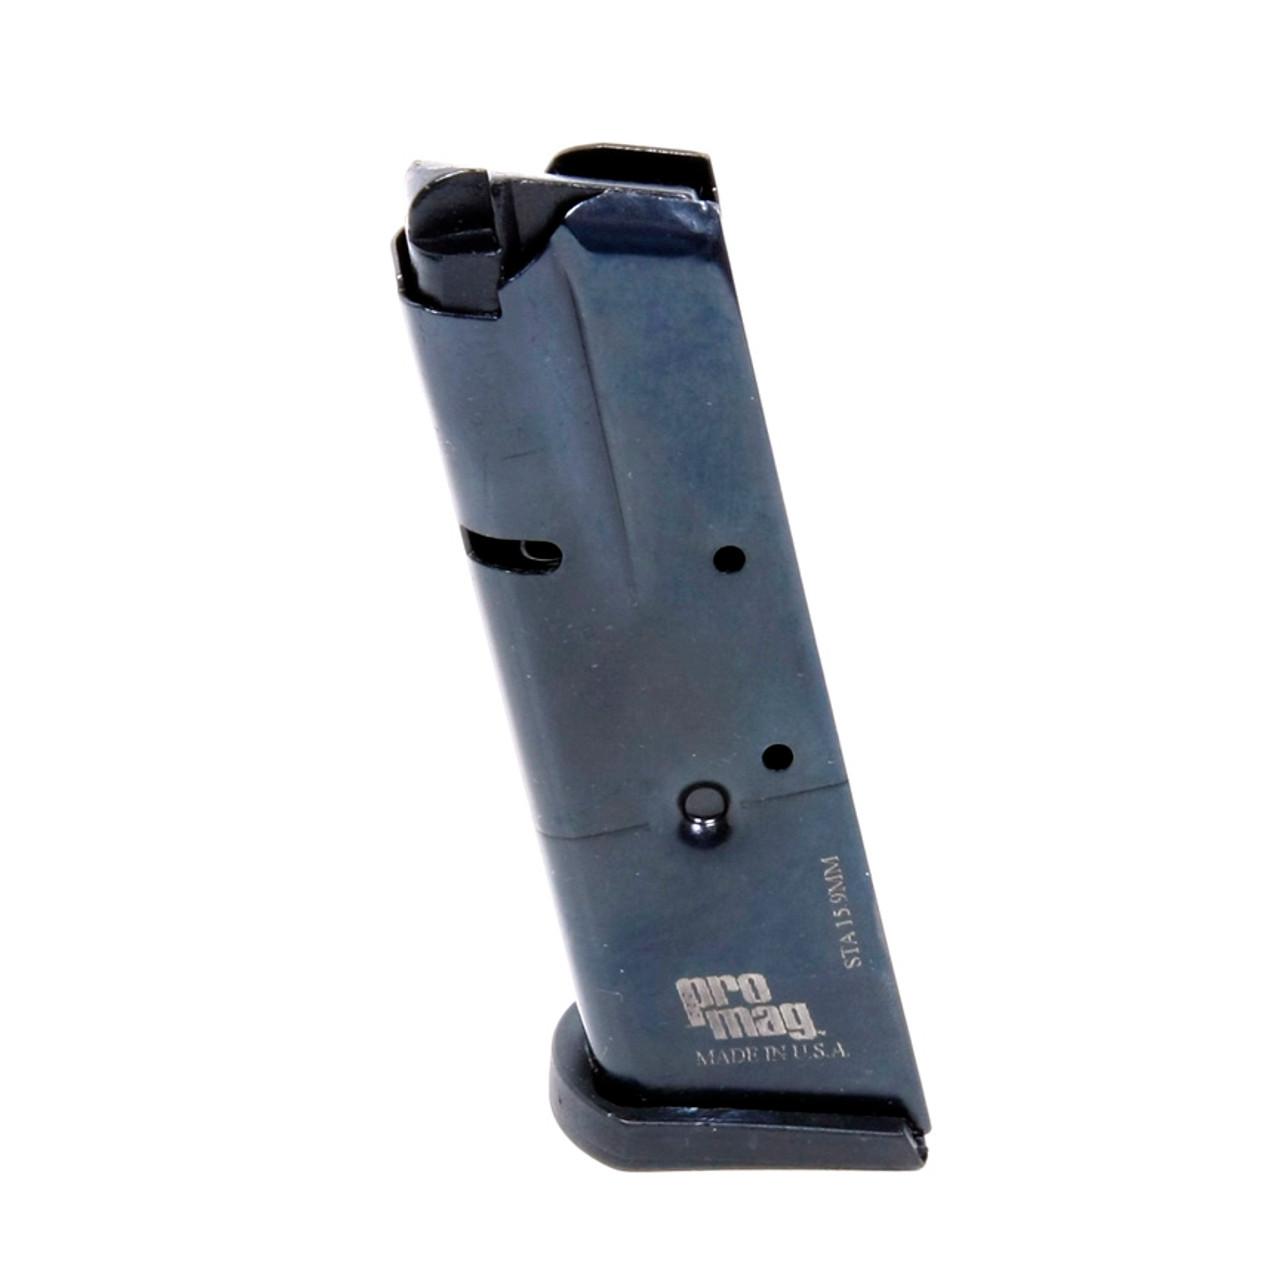 Star Firestar Plus 9mm (10) Rd - Blue Steel